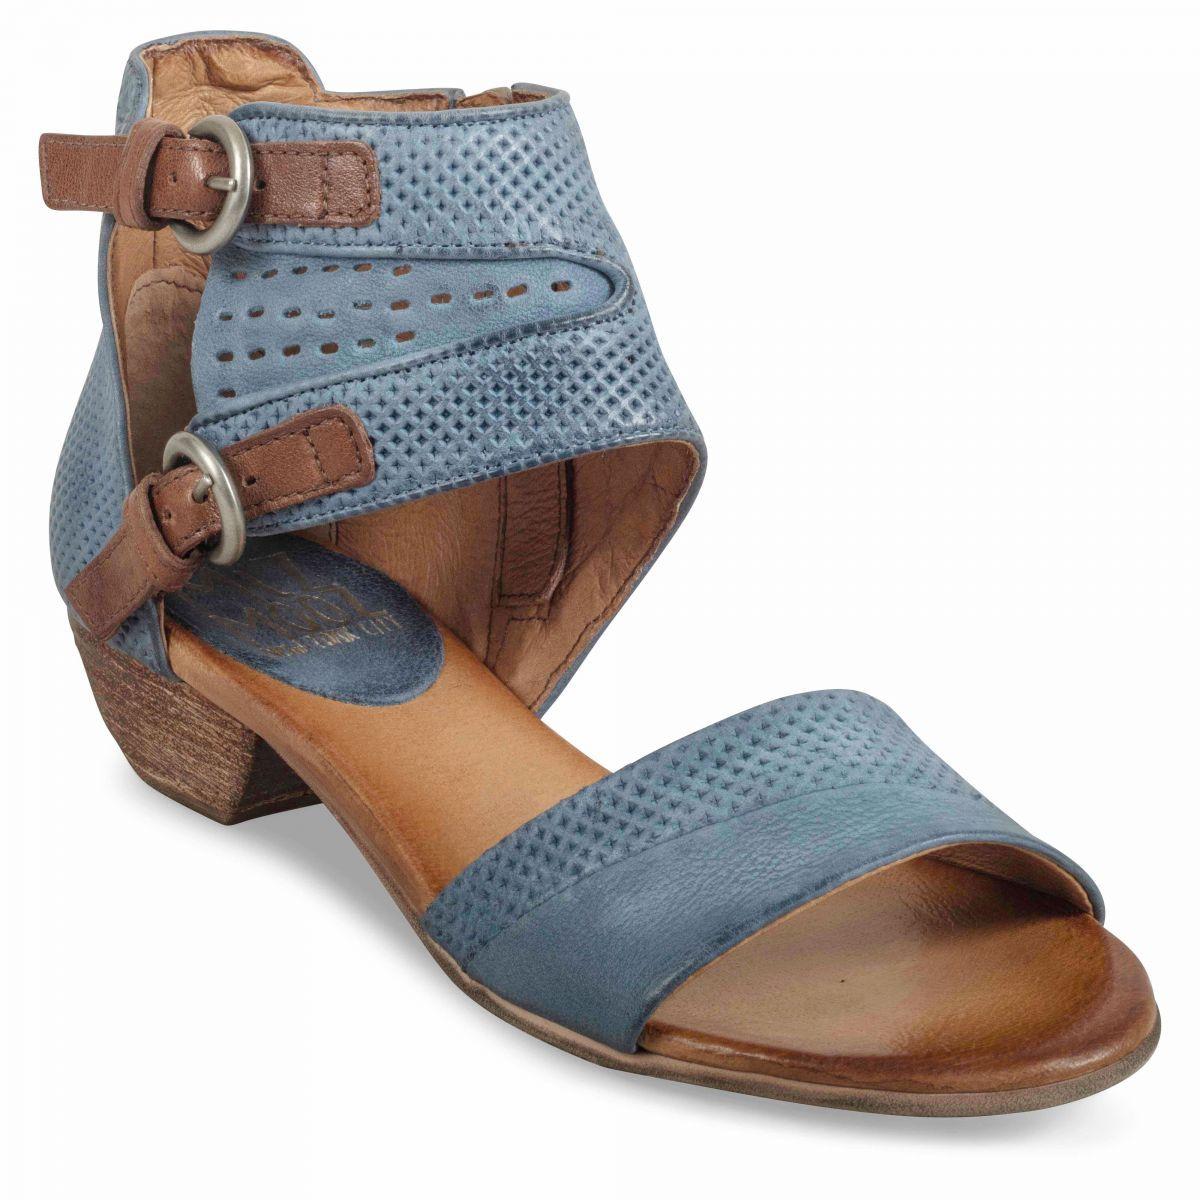 Miz Mooz Colette Women's Ankle Strap